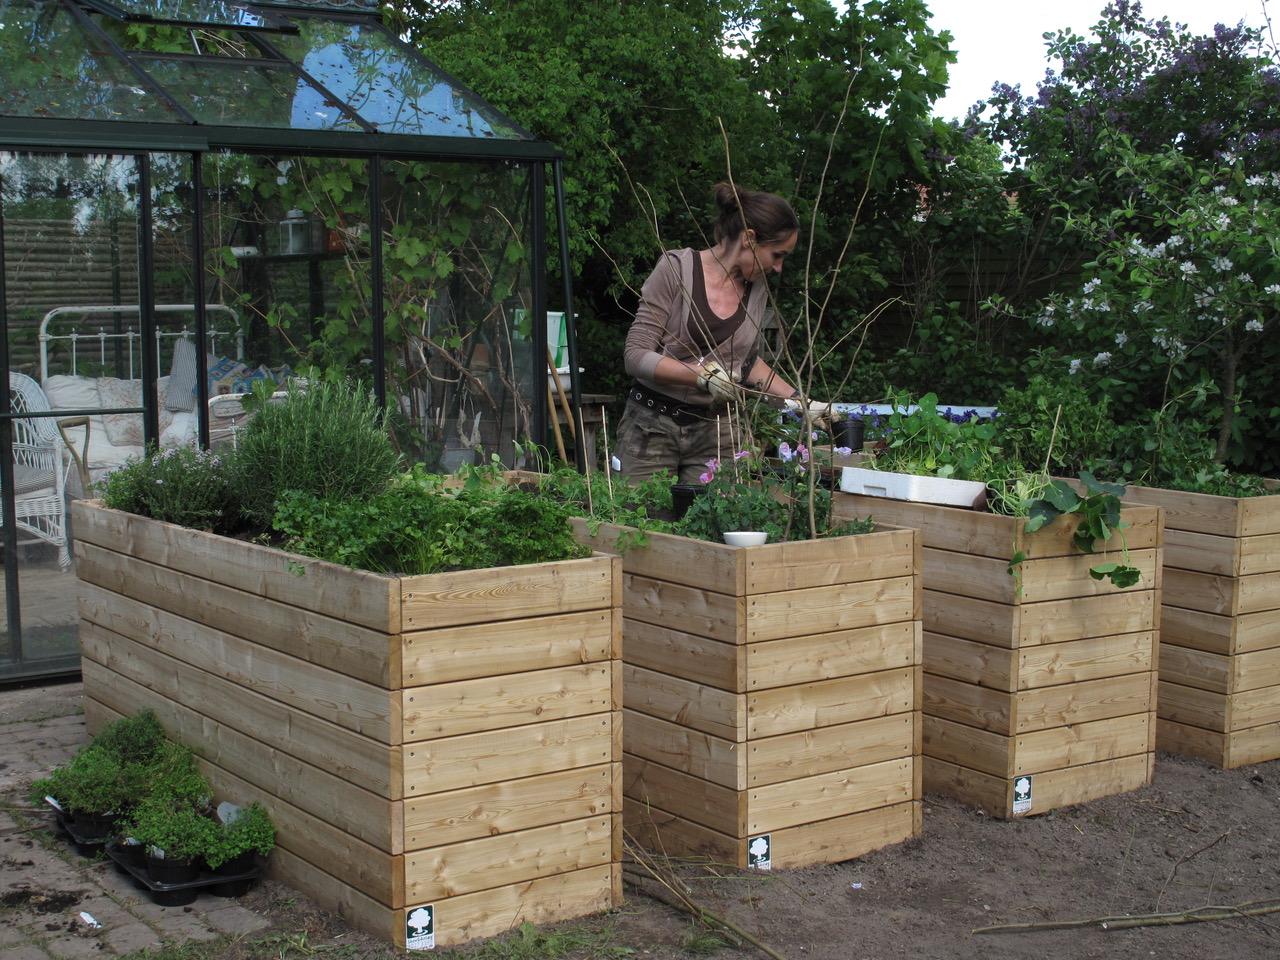 Smuk Tre gode måder at dyrke i højbed + bygge plantekasser | Signe KK-11